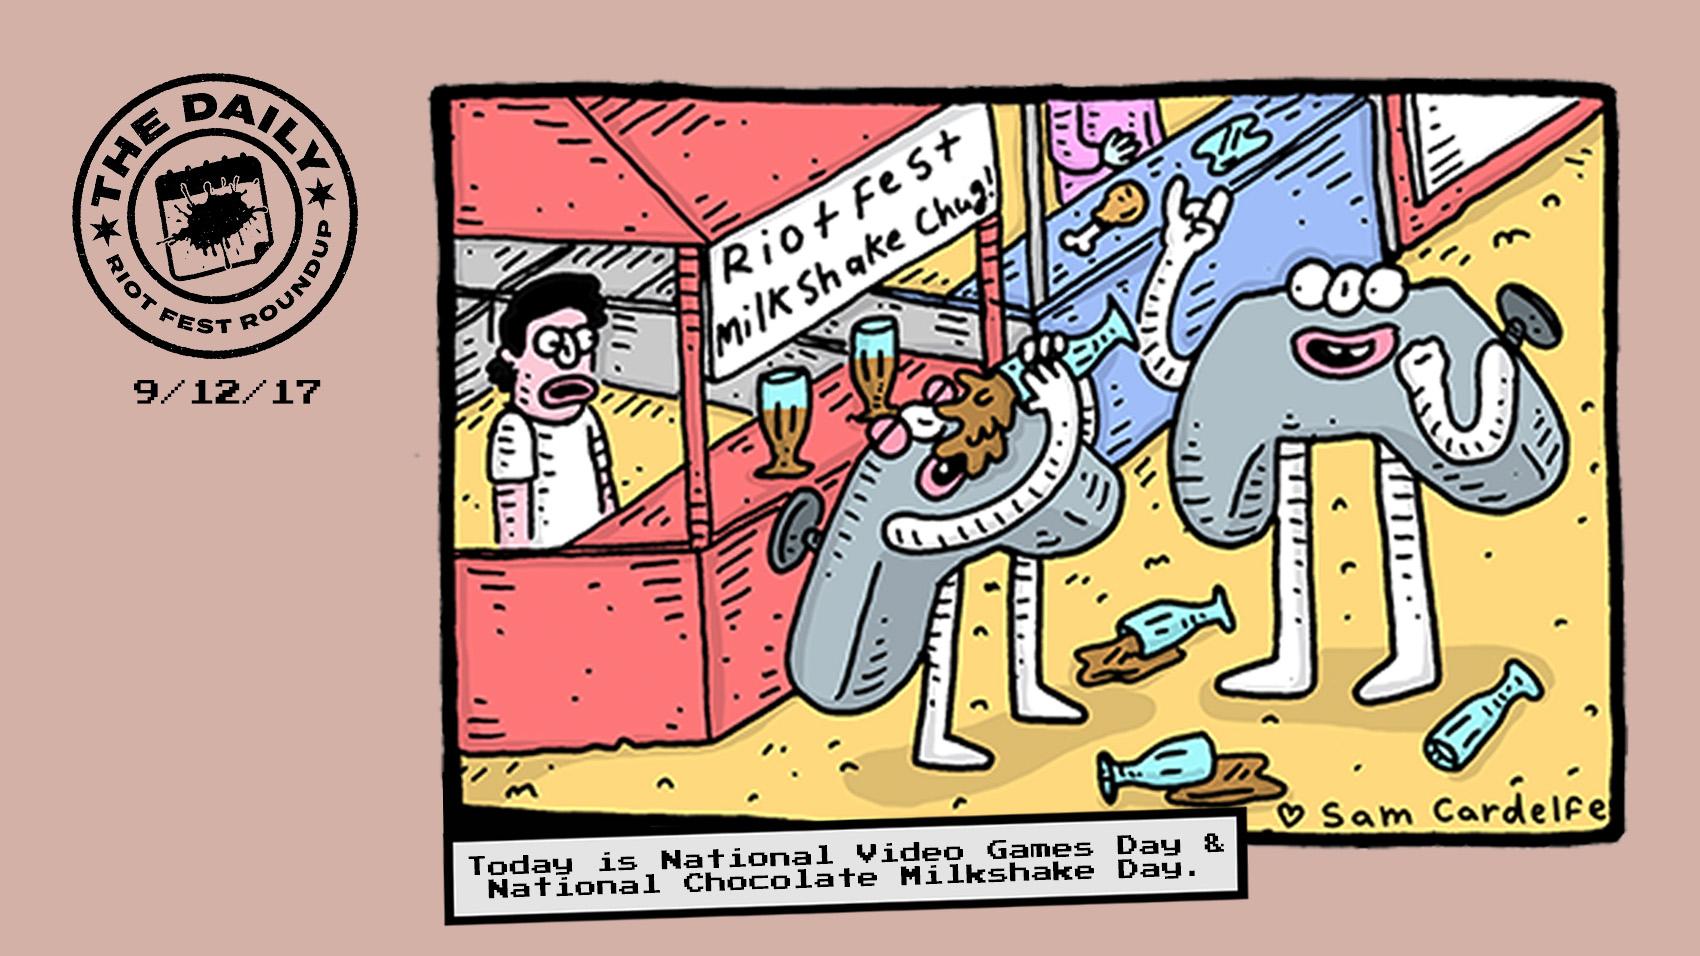 Riot fest clipart graphic free Daily Riot Fest Roundup | Riot Fest graphic free